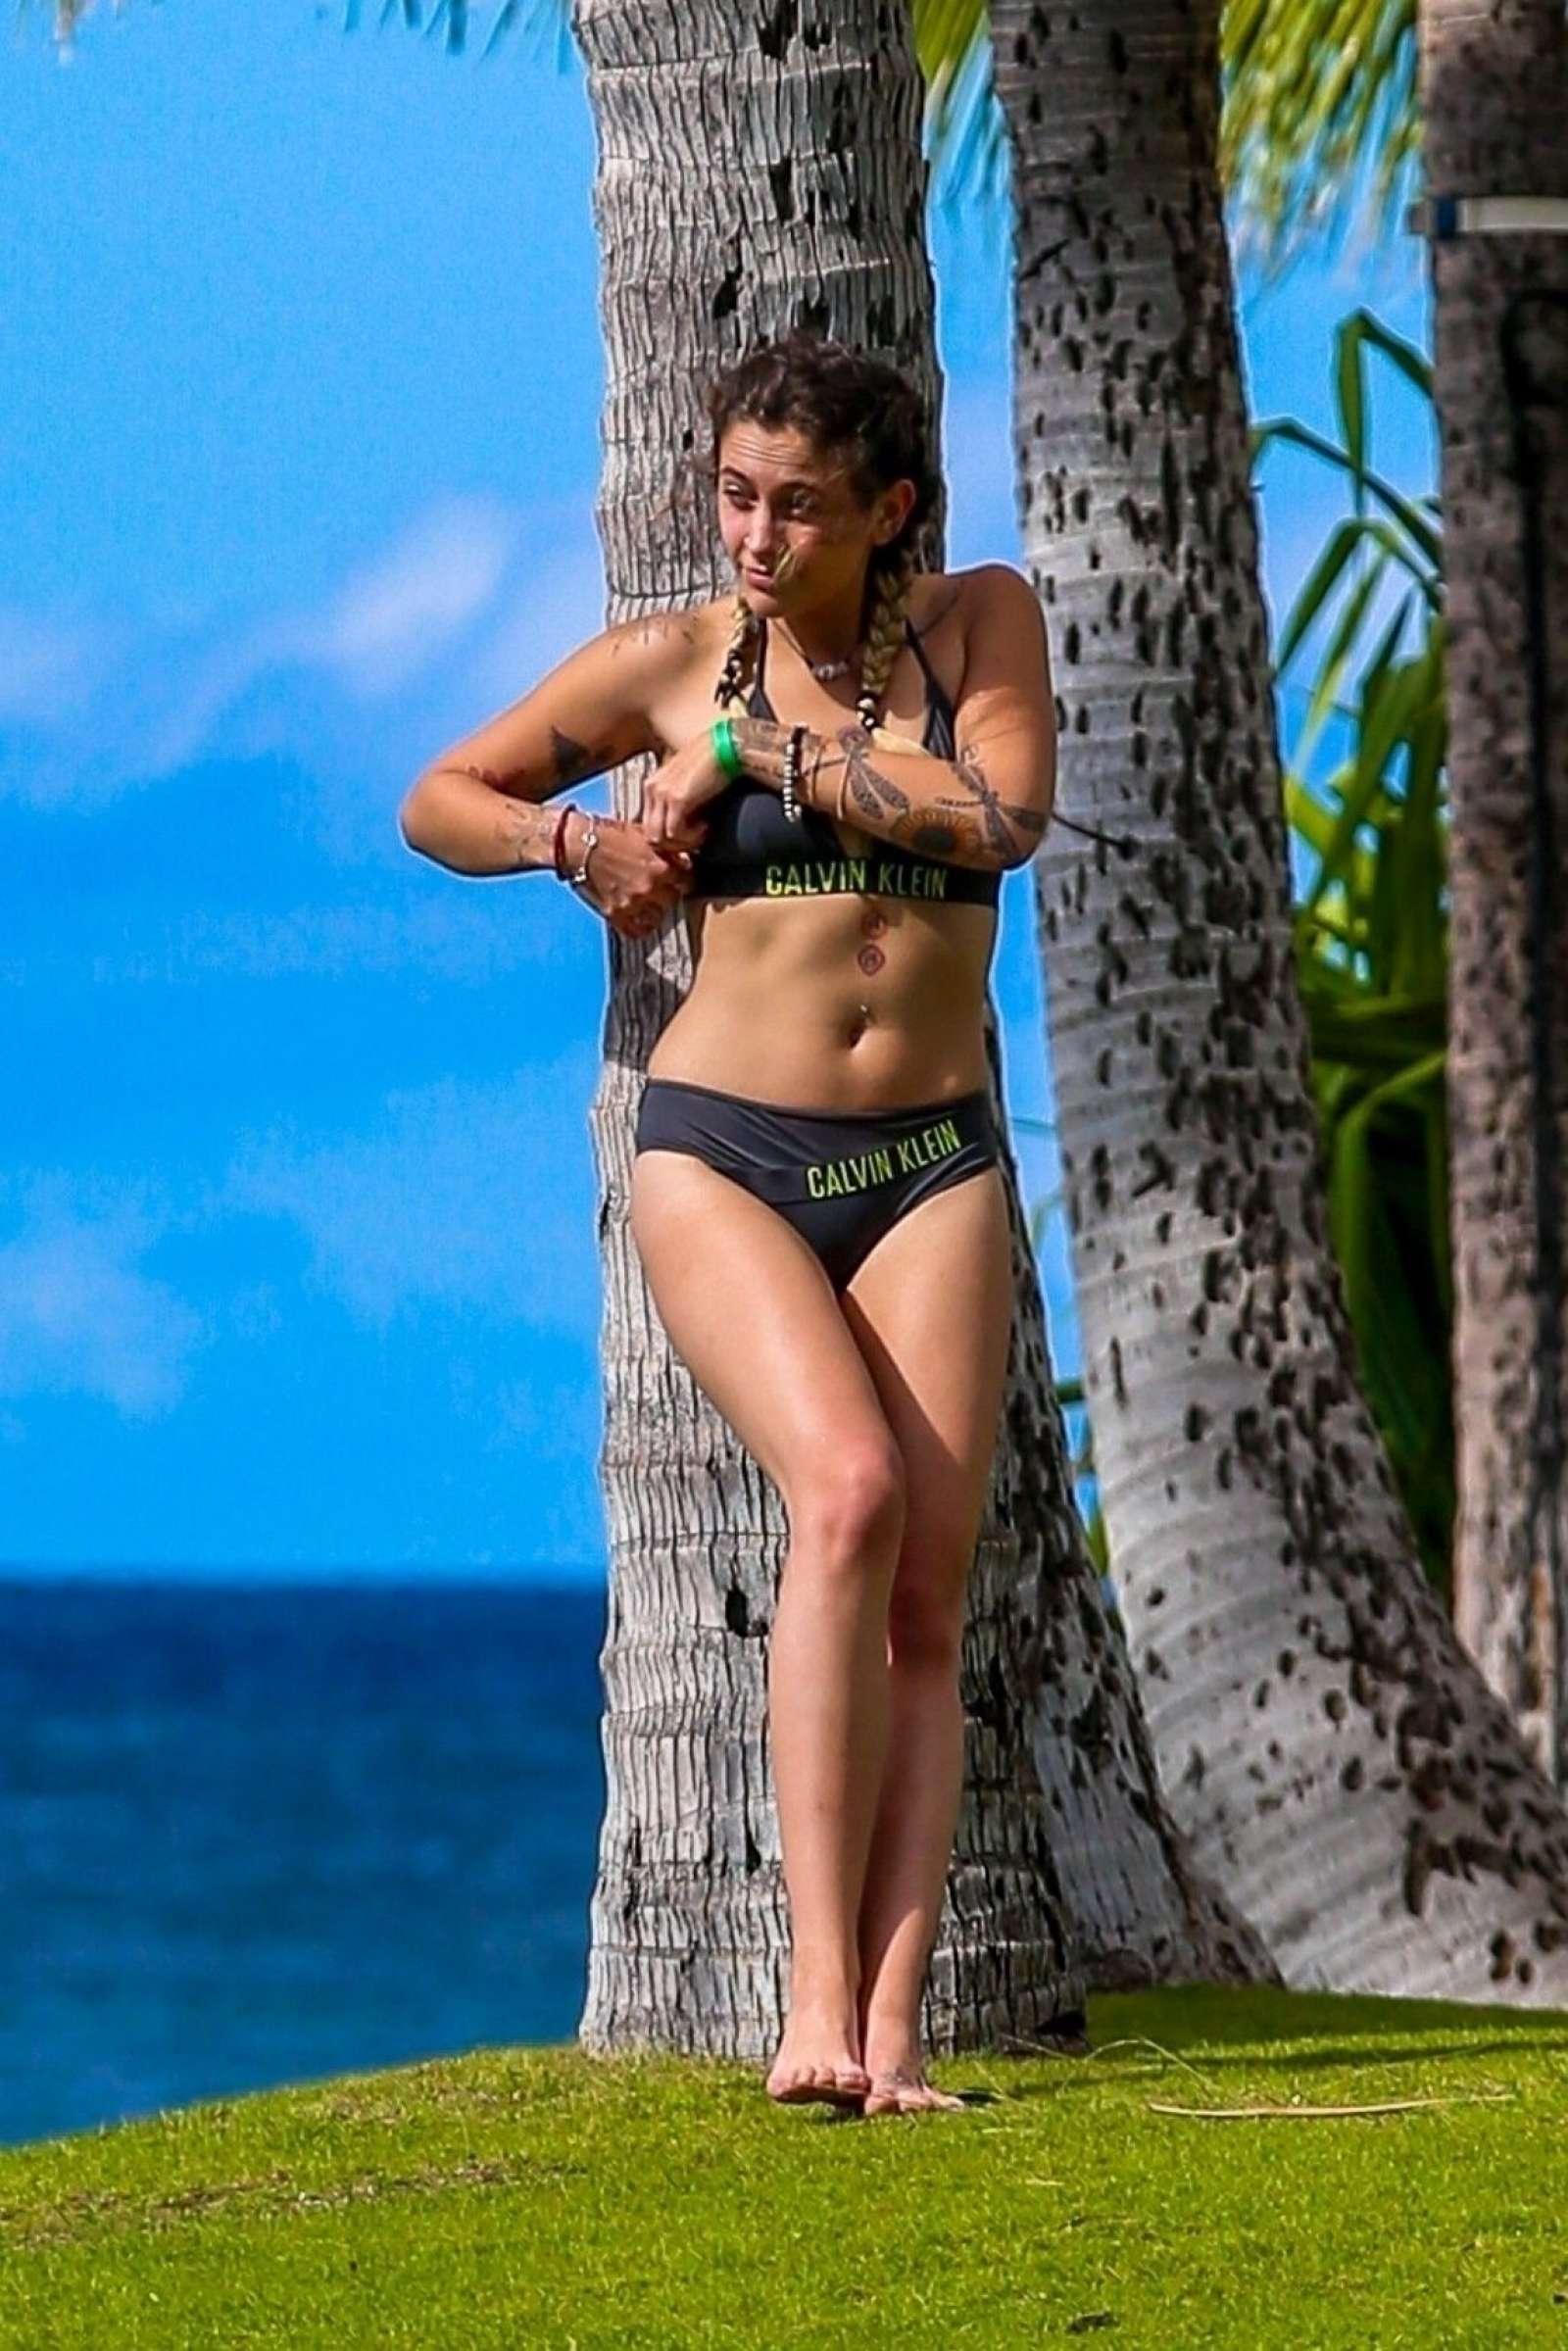 Bikini Paris Jackson nudes (31 photo), Pussy, Hot, Instagram, butt 2020